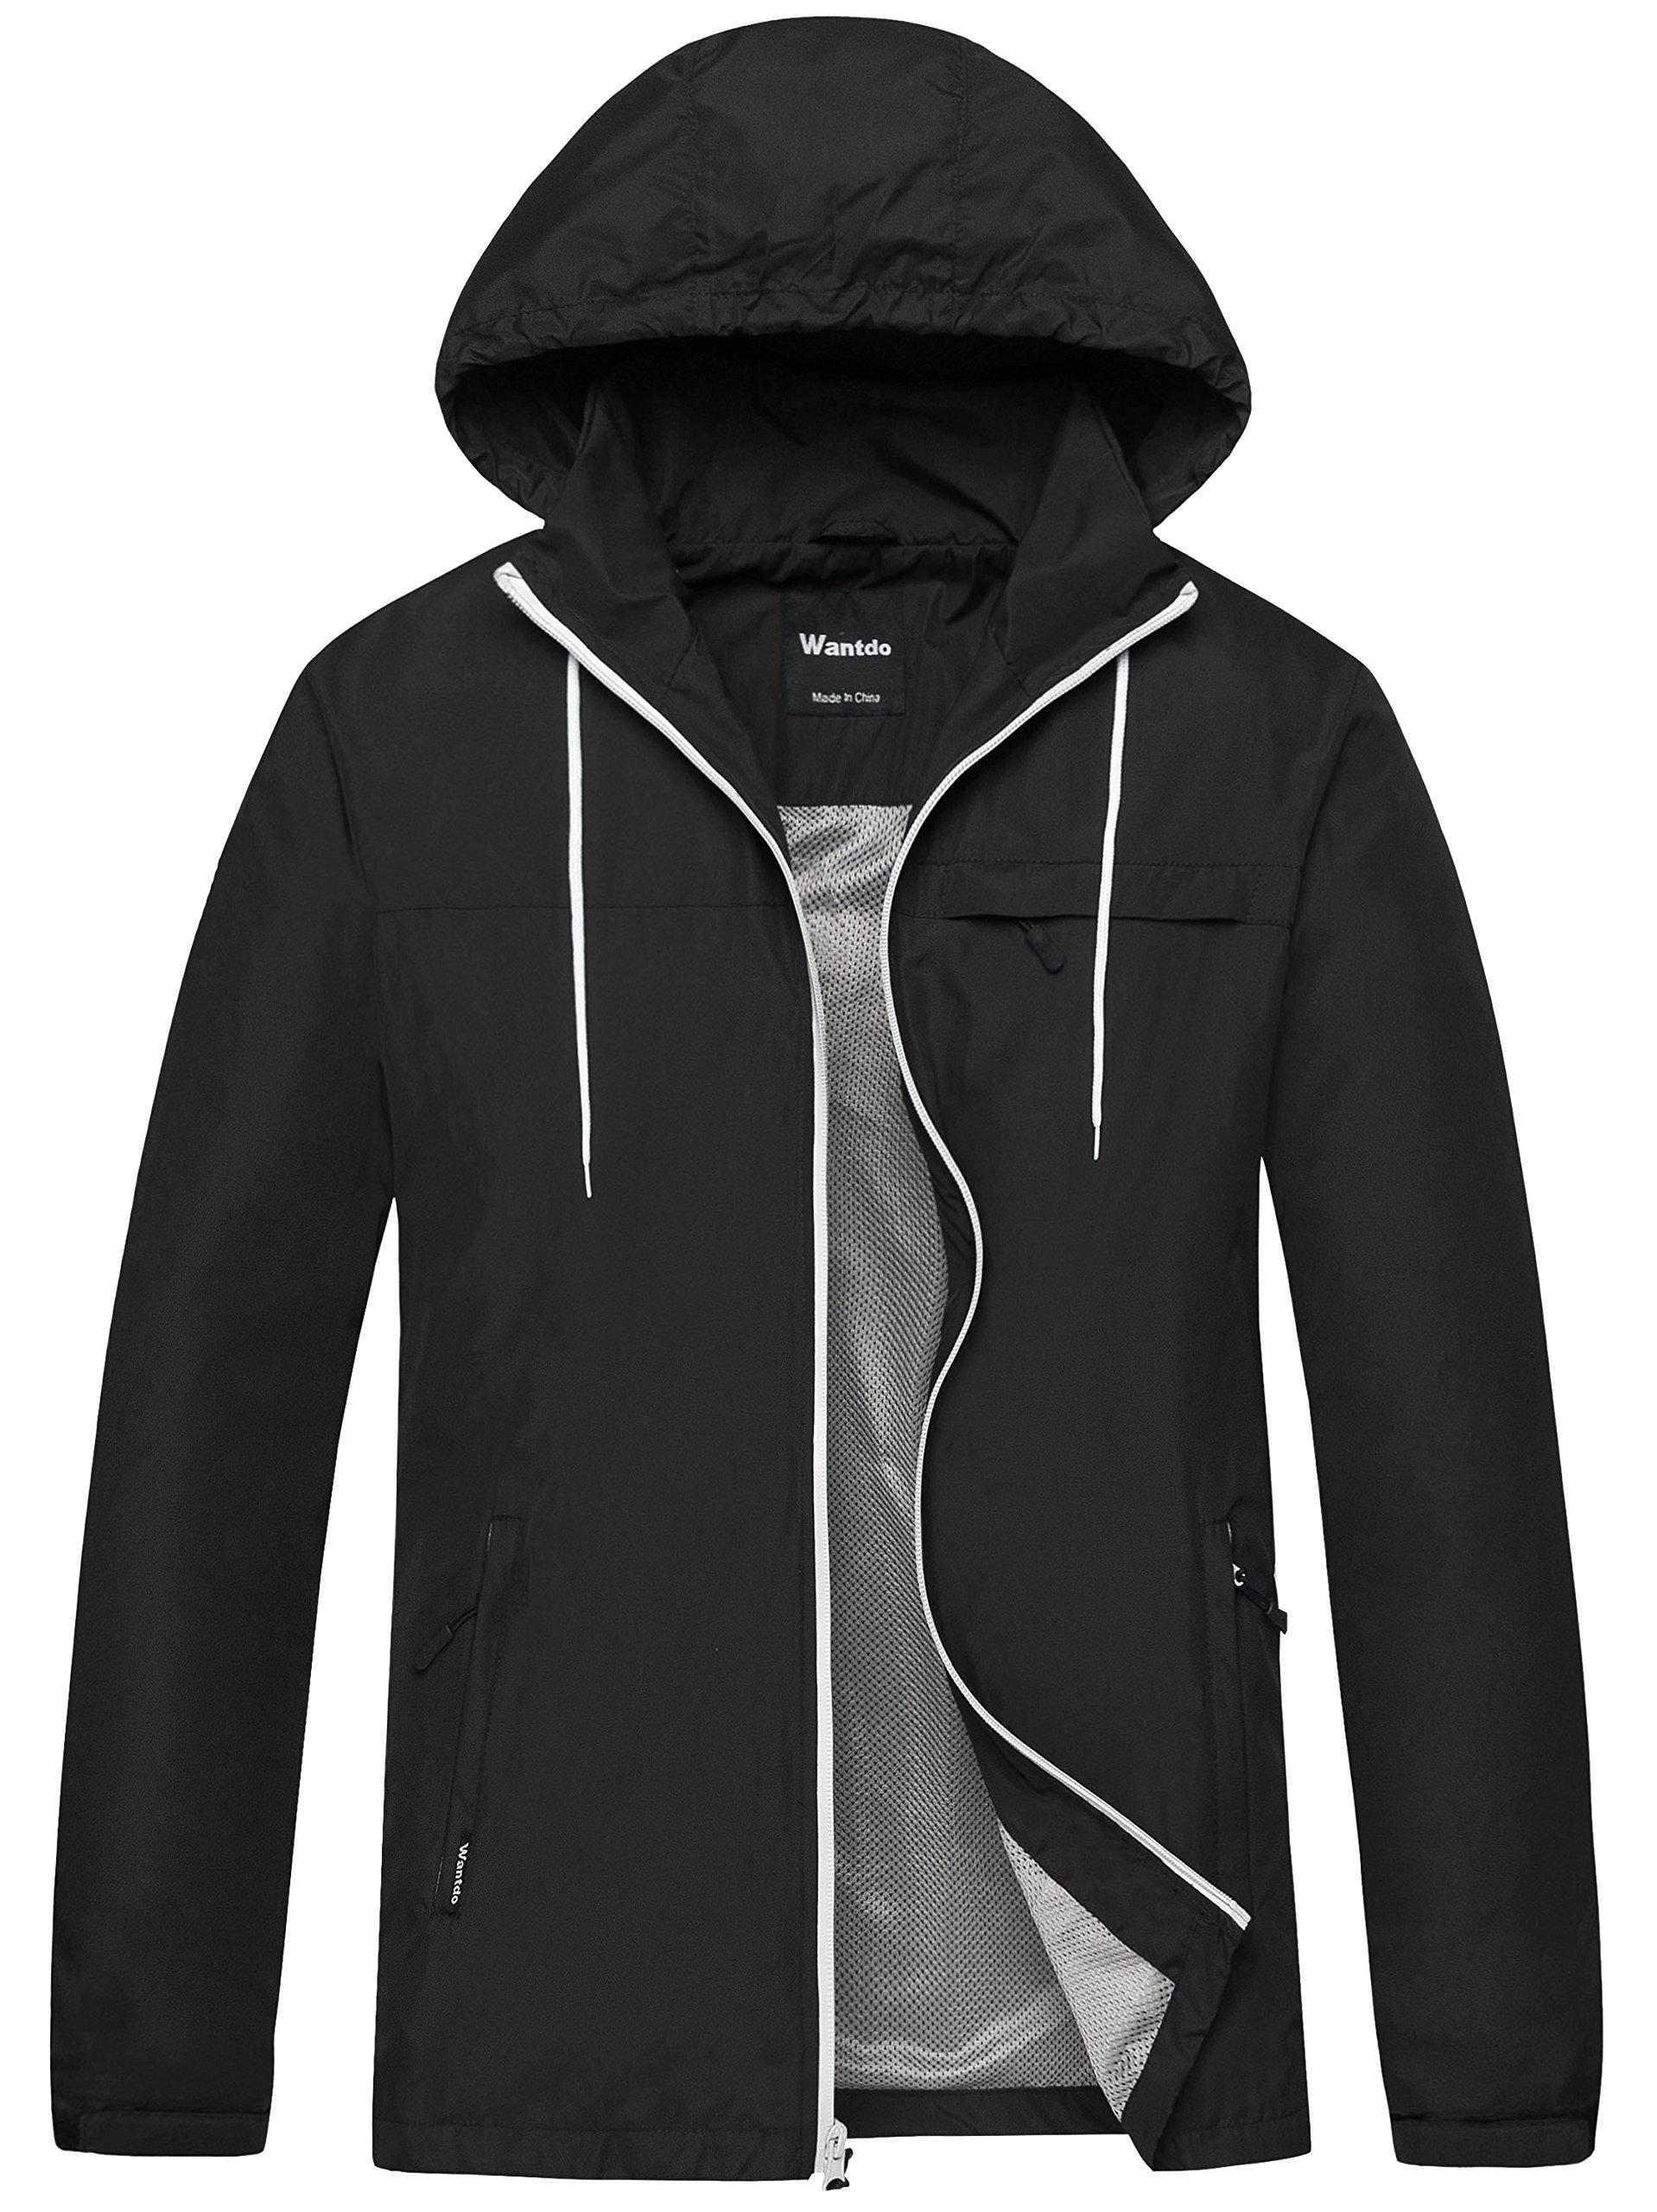 Wantdo Men's Windbreaker Shell Jacket Quick Dry UV Protect Skin Jacket with Folding Hood US Large Black